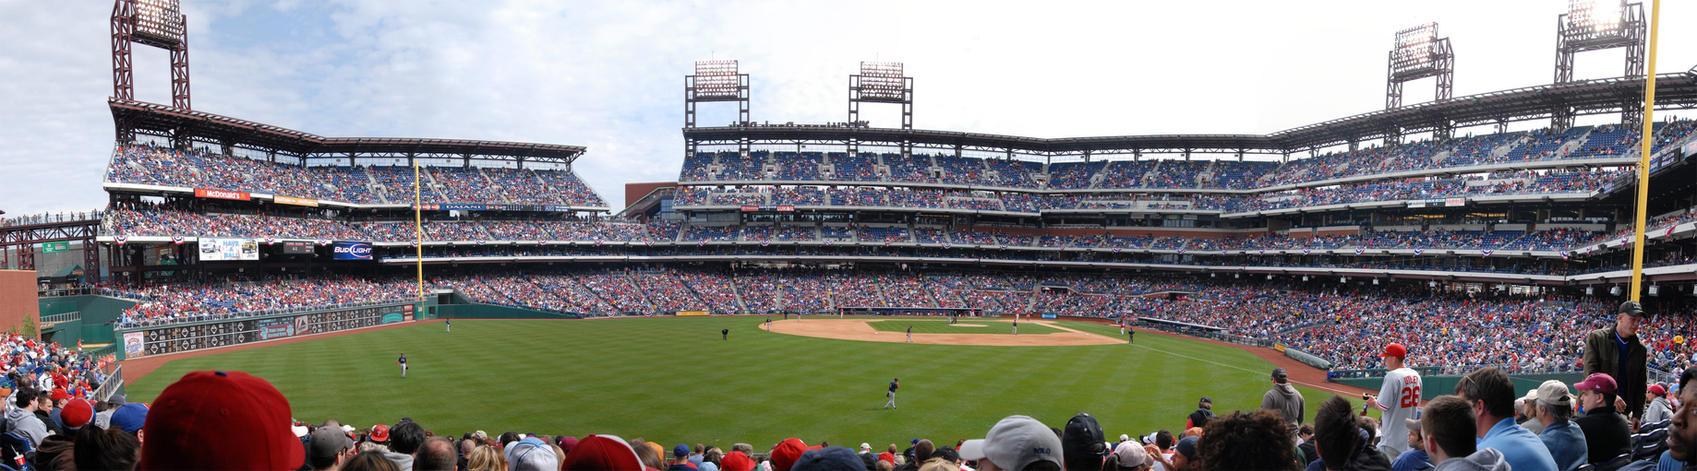 CitizensBank Park Philadelphia by djbahdow-2101